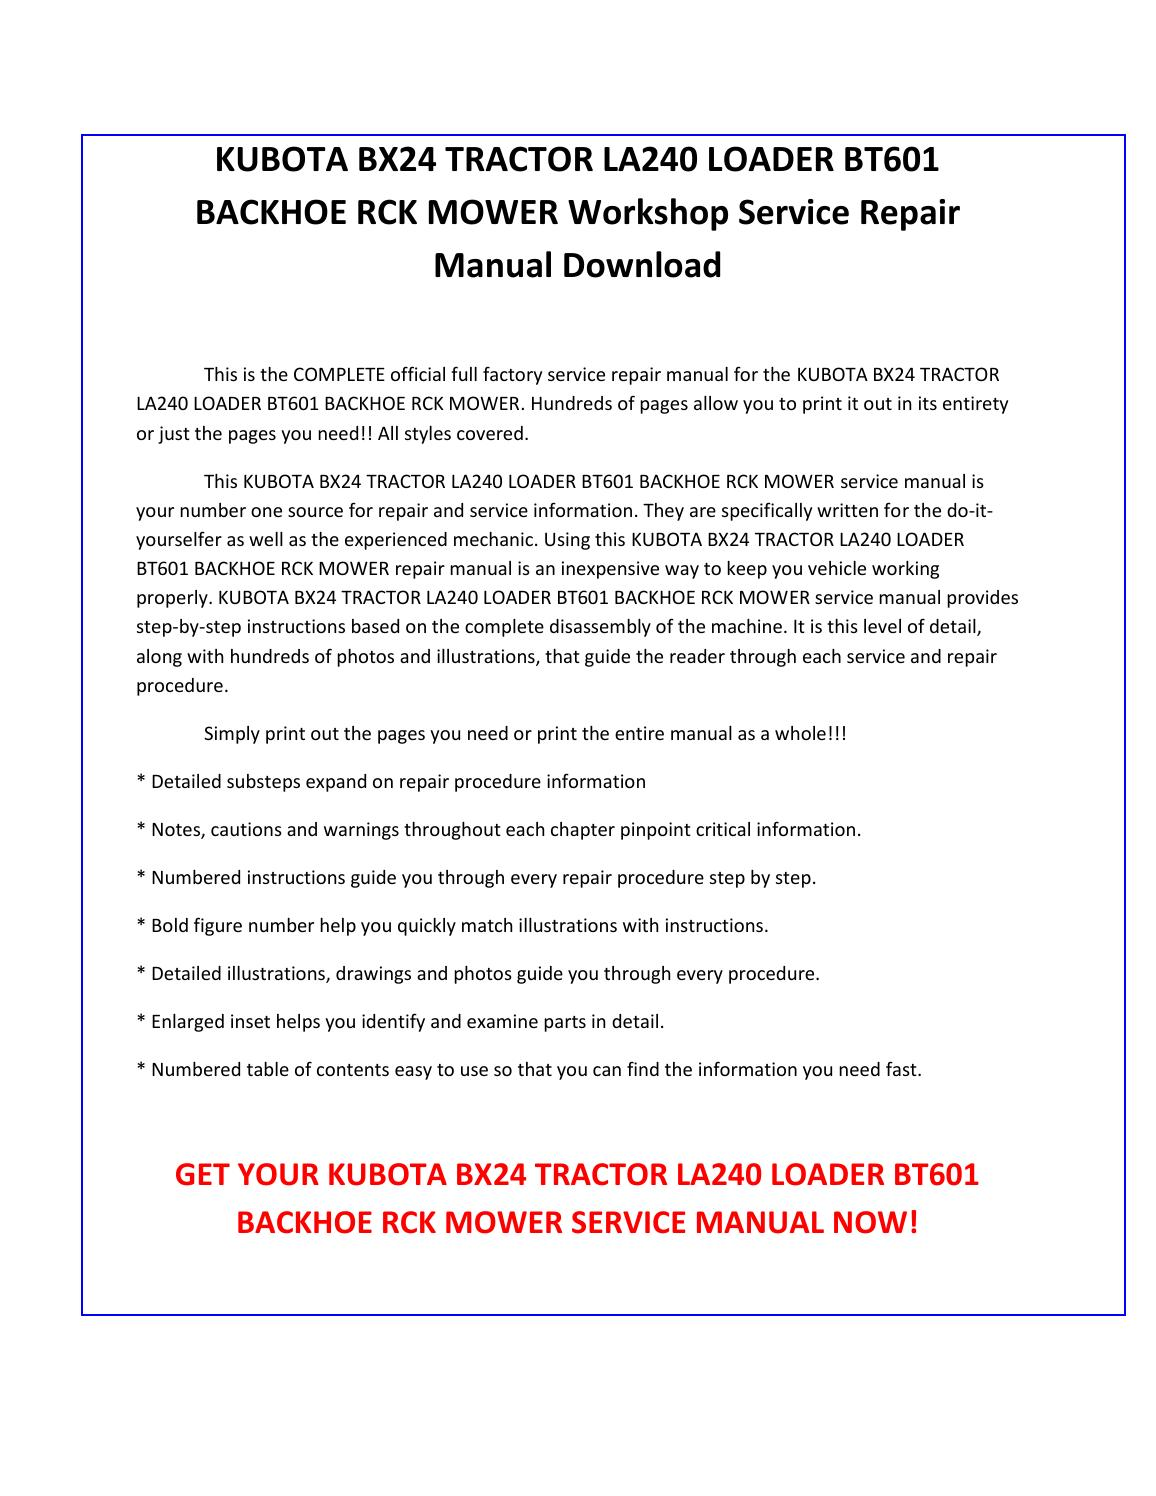 Kubota bx24 tractor la240 loader bt601 backhoe rck mower service repair  manual pdf download by sparchita3 - issuu